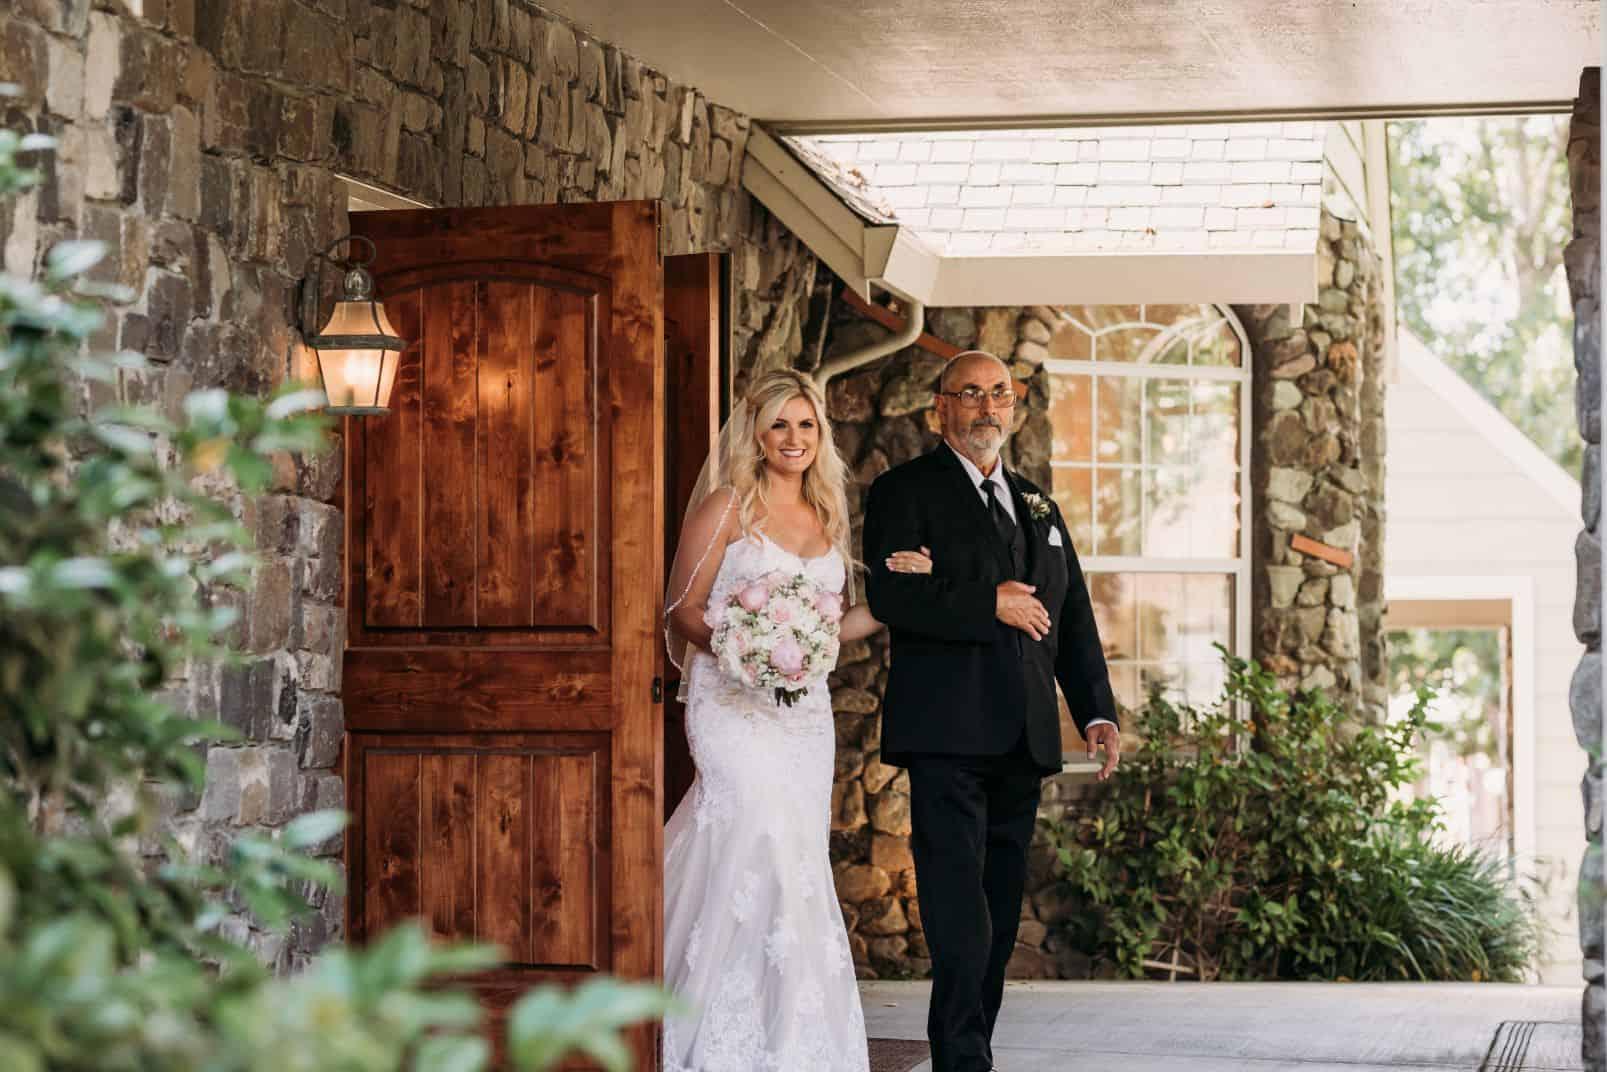 2 lawn pond ballroom mountain house estate weddingi venues northern california